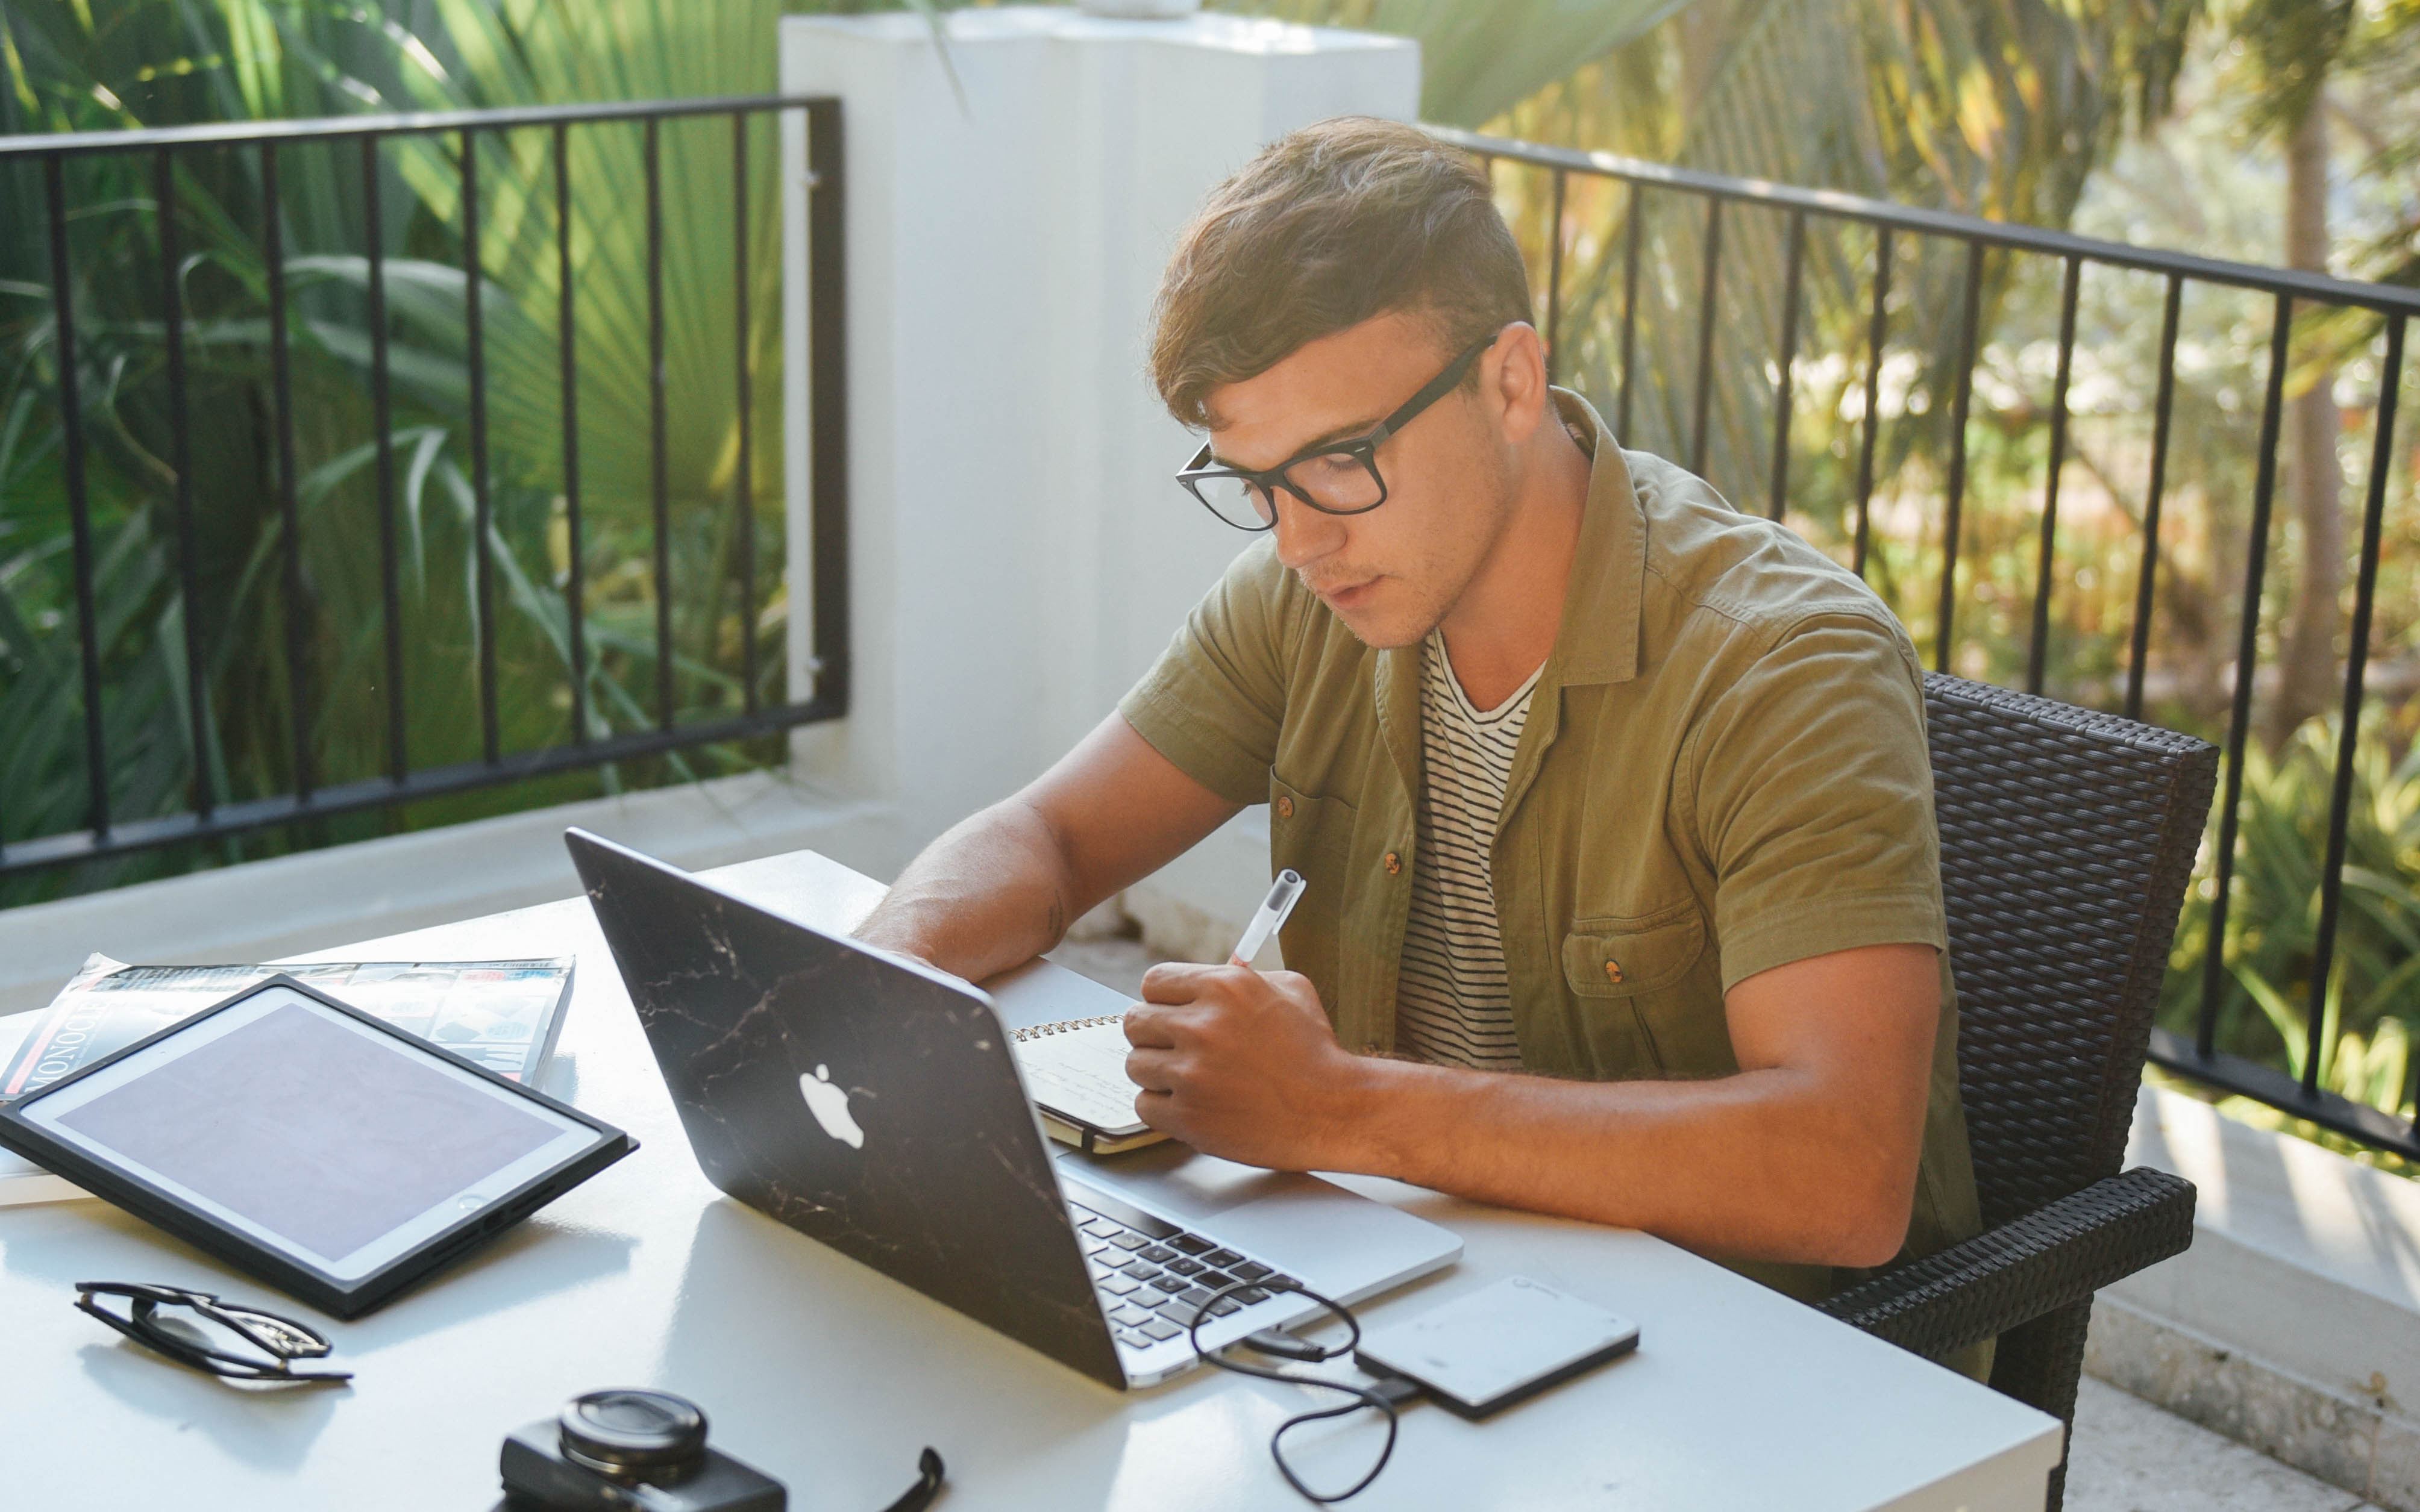 Scout Sixteen - Ray Ban Wayfarer Glasses.com